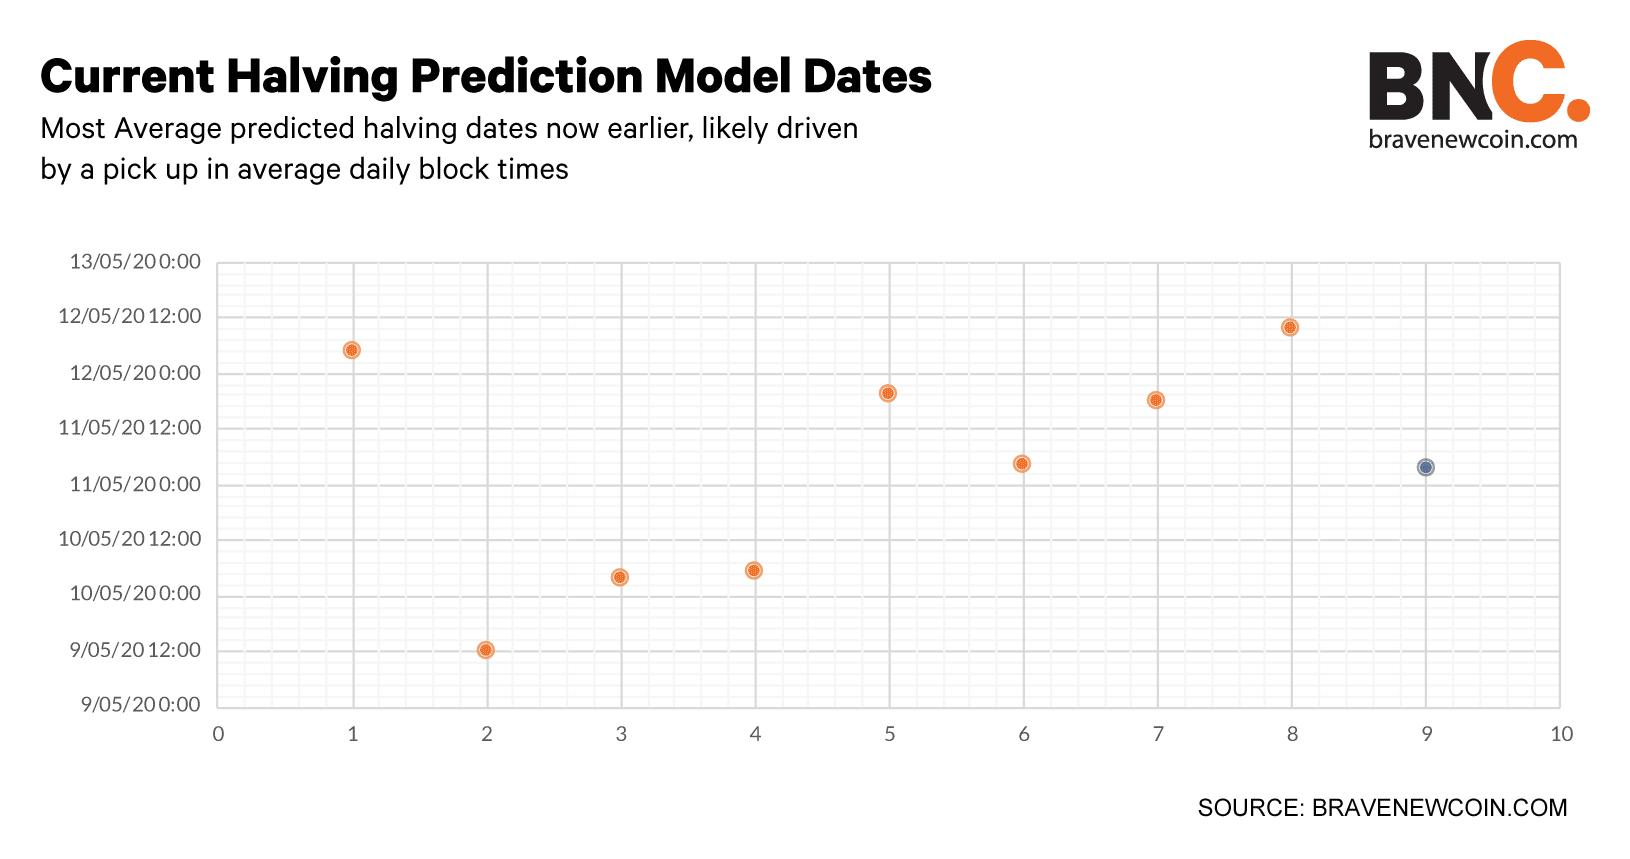 Current-halving-prediction-model-dates